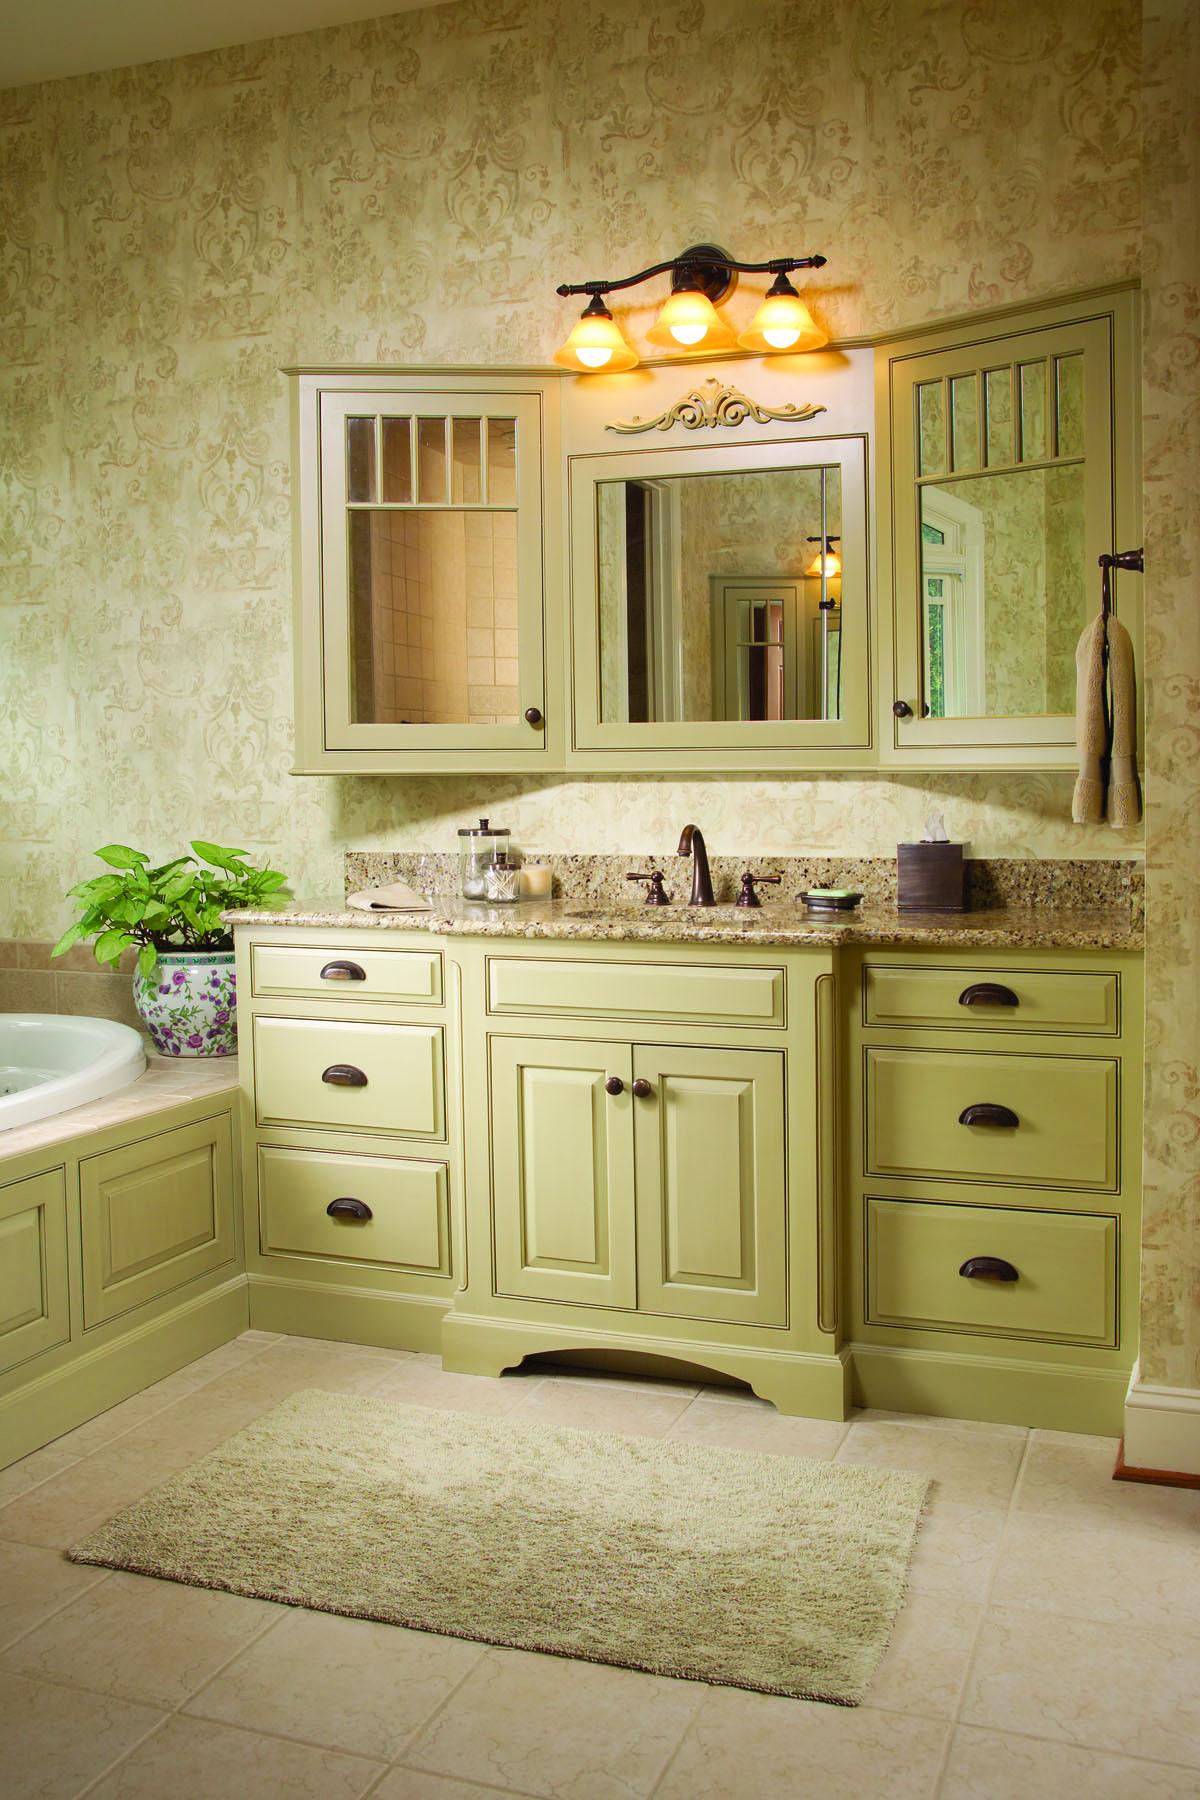 Kitchen And Bath Design Jobs Pittsburgh Inspirational